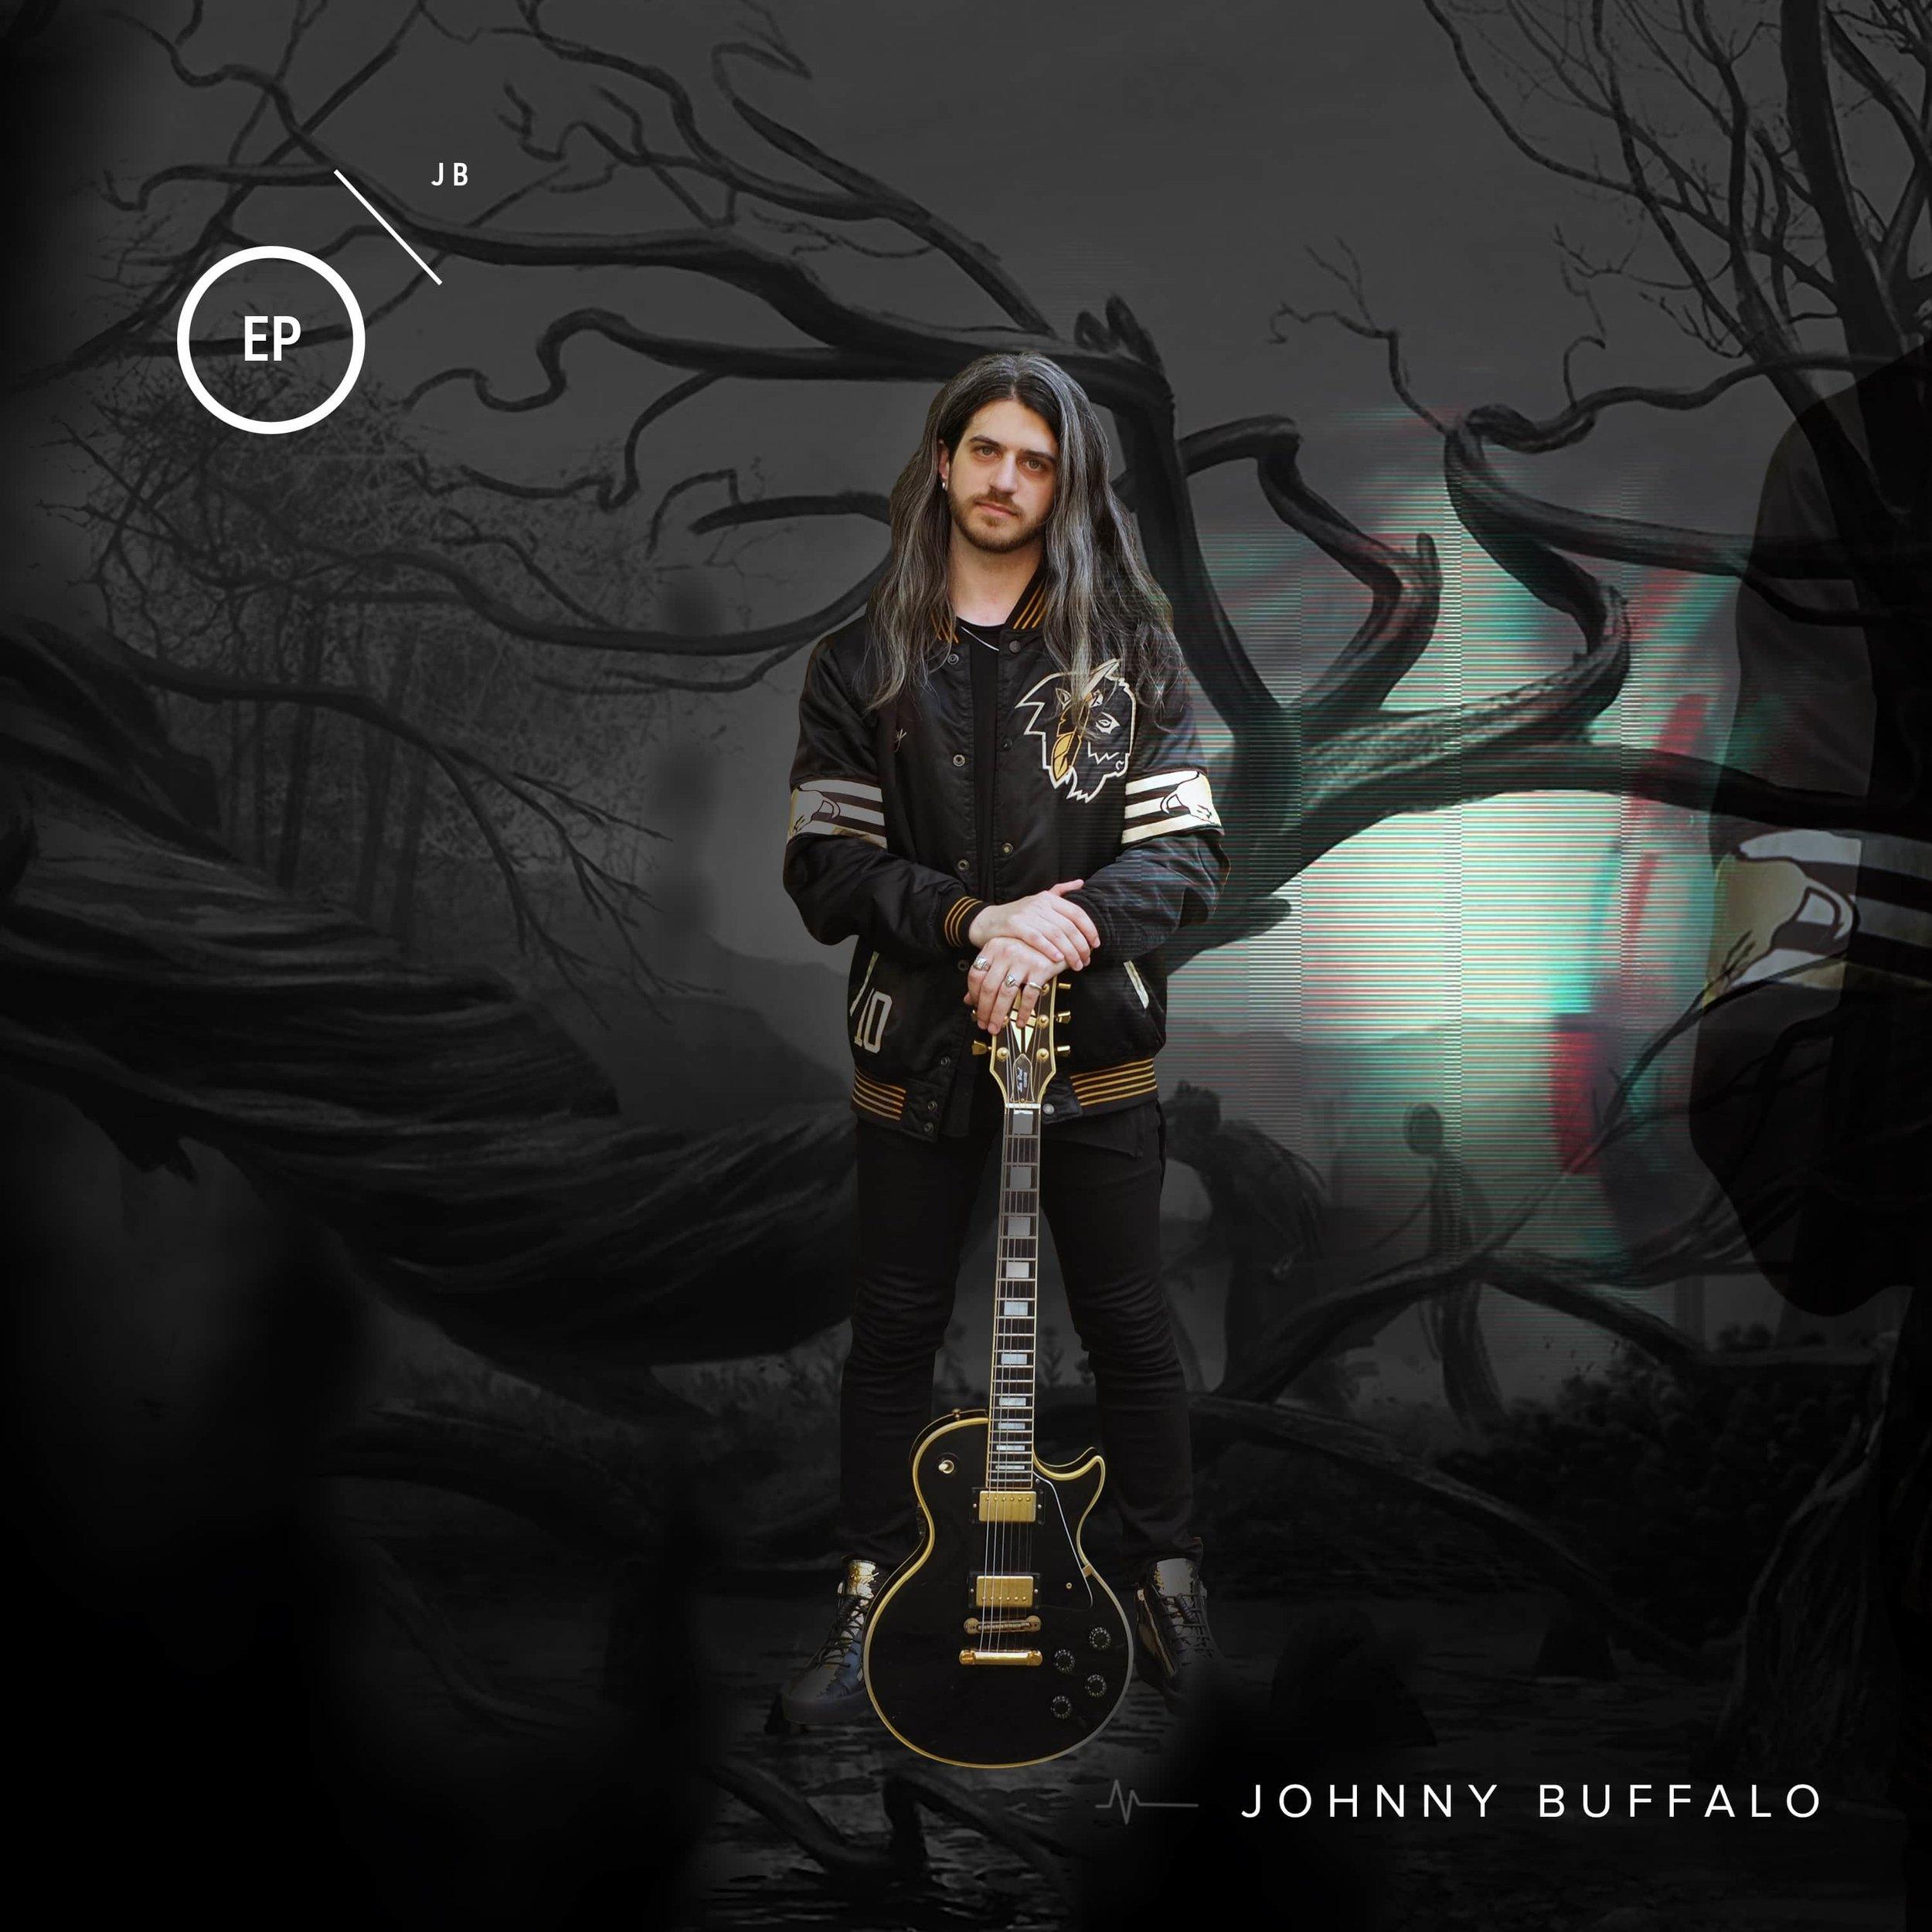 Johnny Buffalo - Welcome to Buffalo EP.jpeg